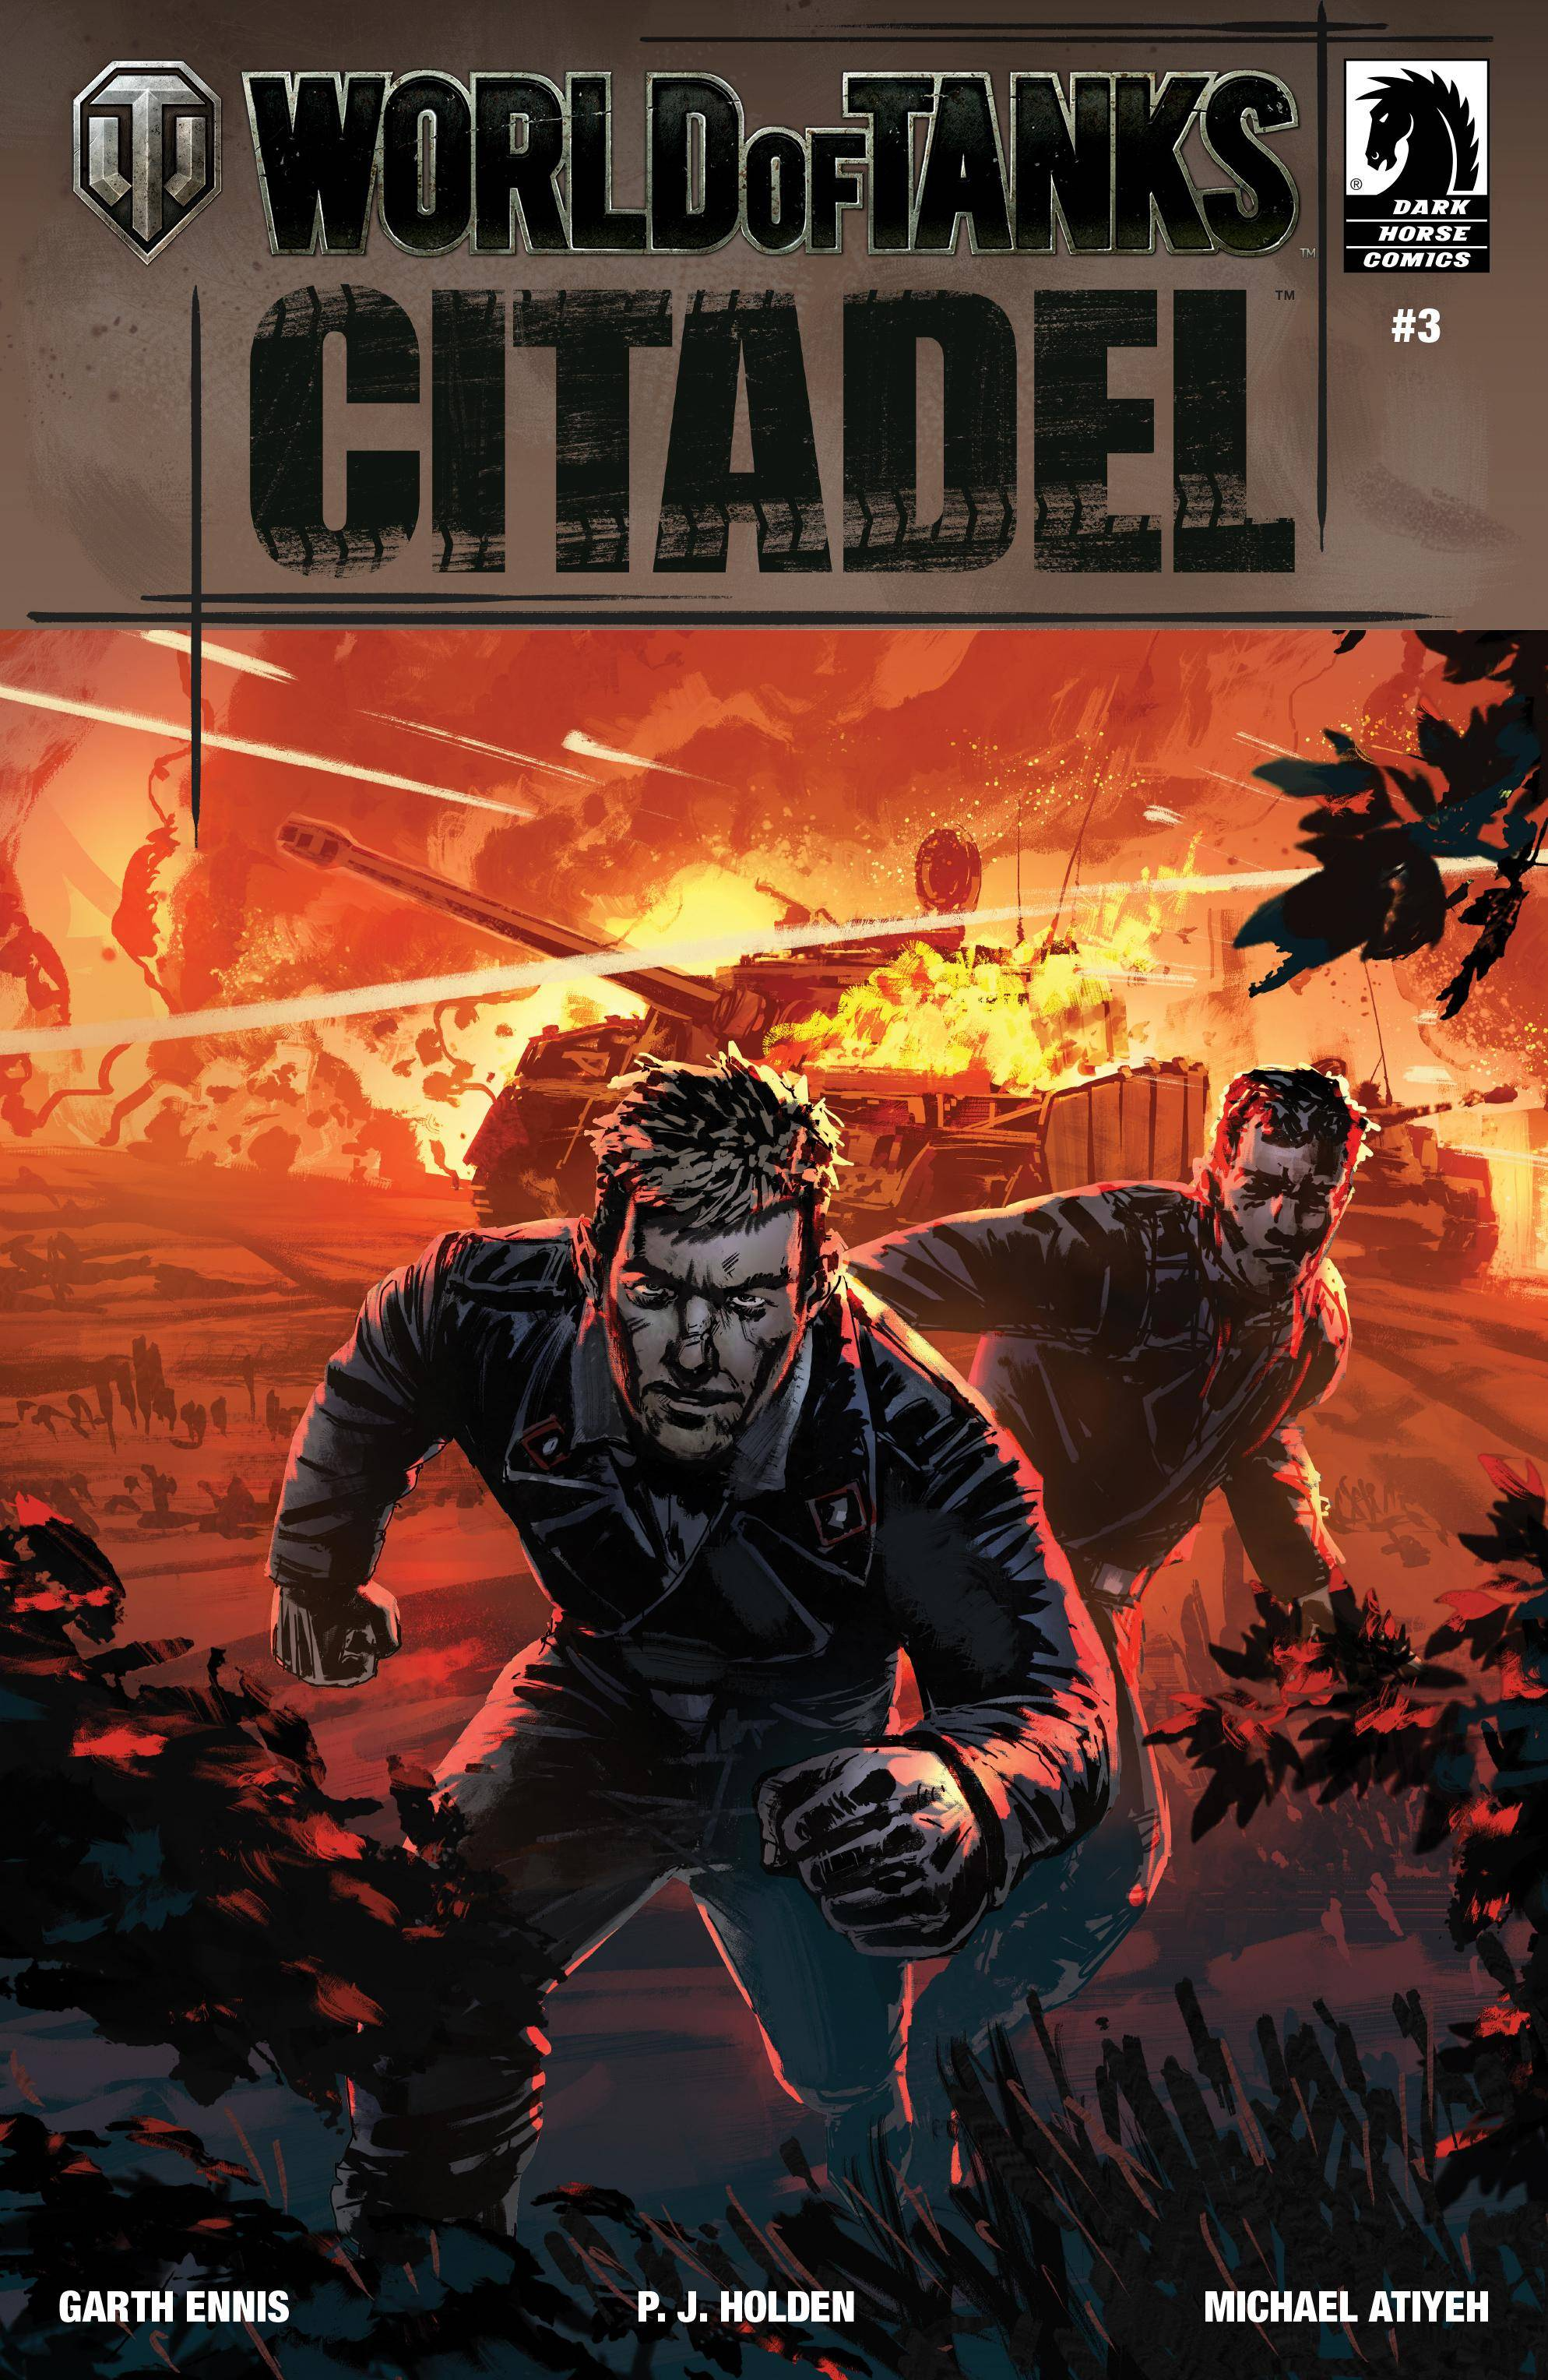 World.of.Tanks.II-Citadel.003.2018.Digital.DR.&.Quinch-Empire